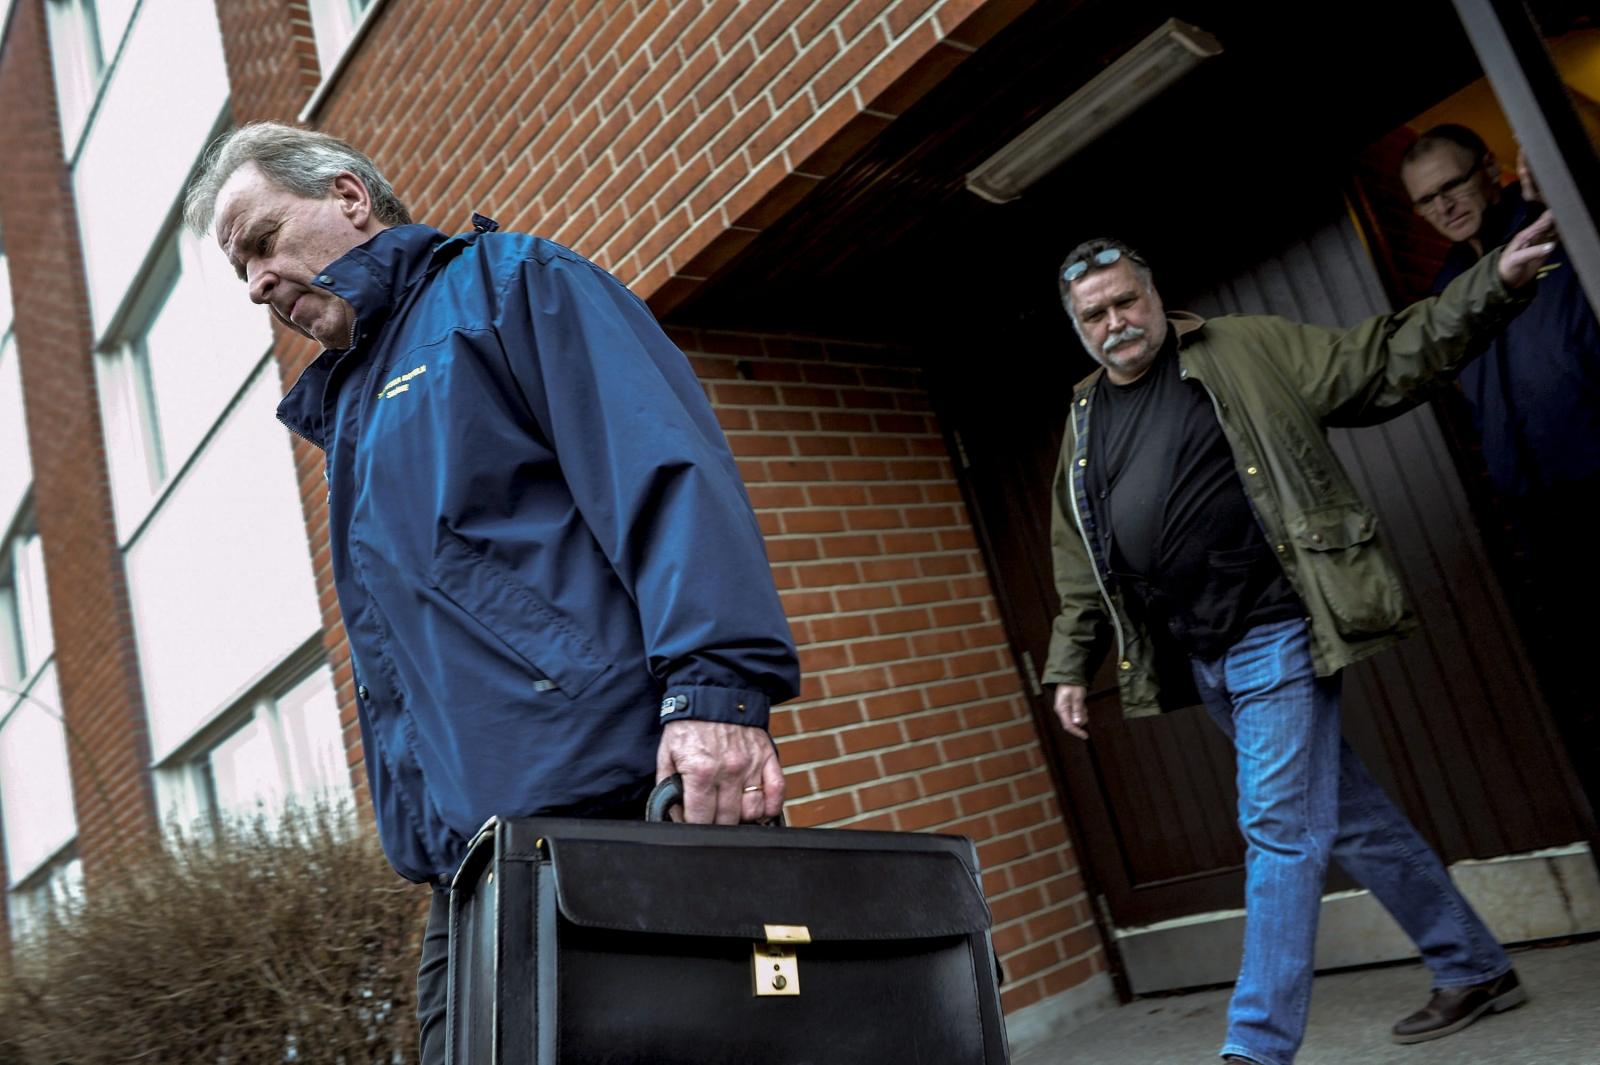 Swedish daughters held captive Bromolla